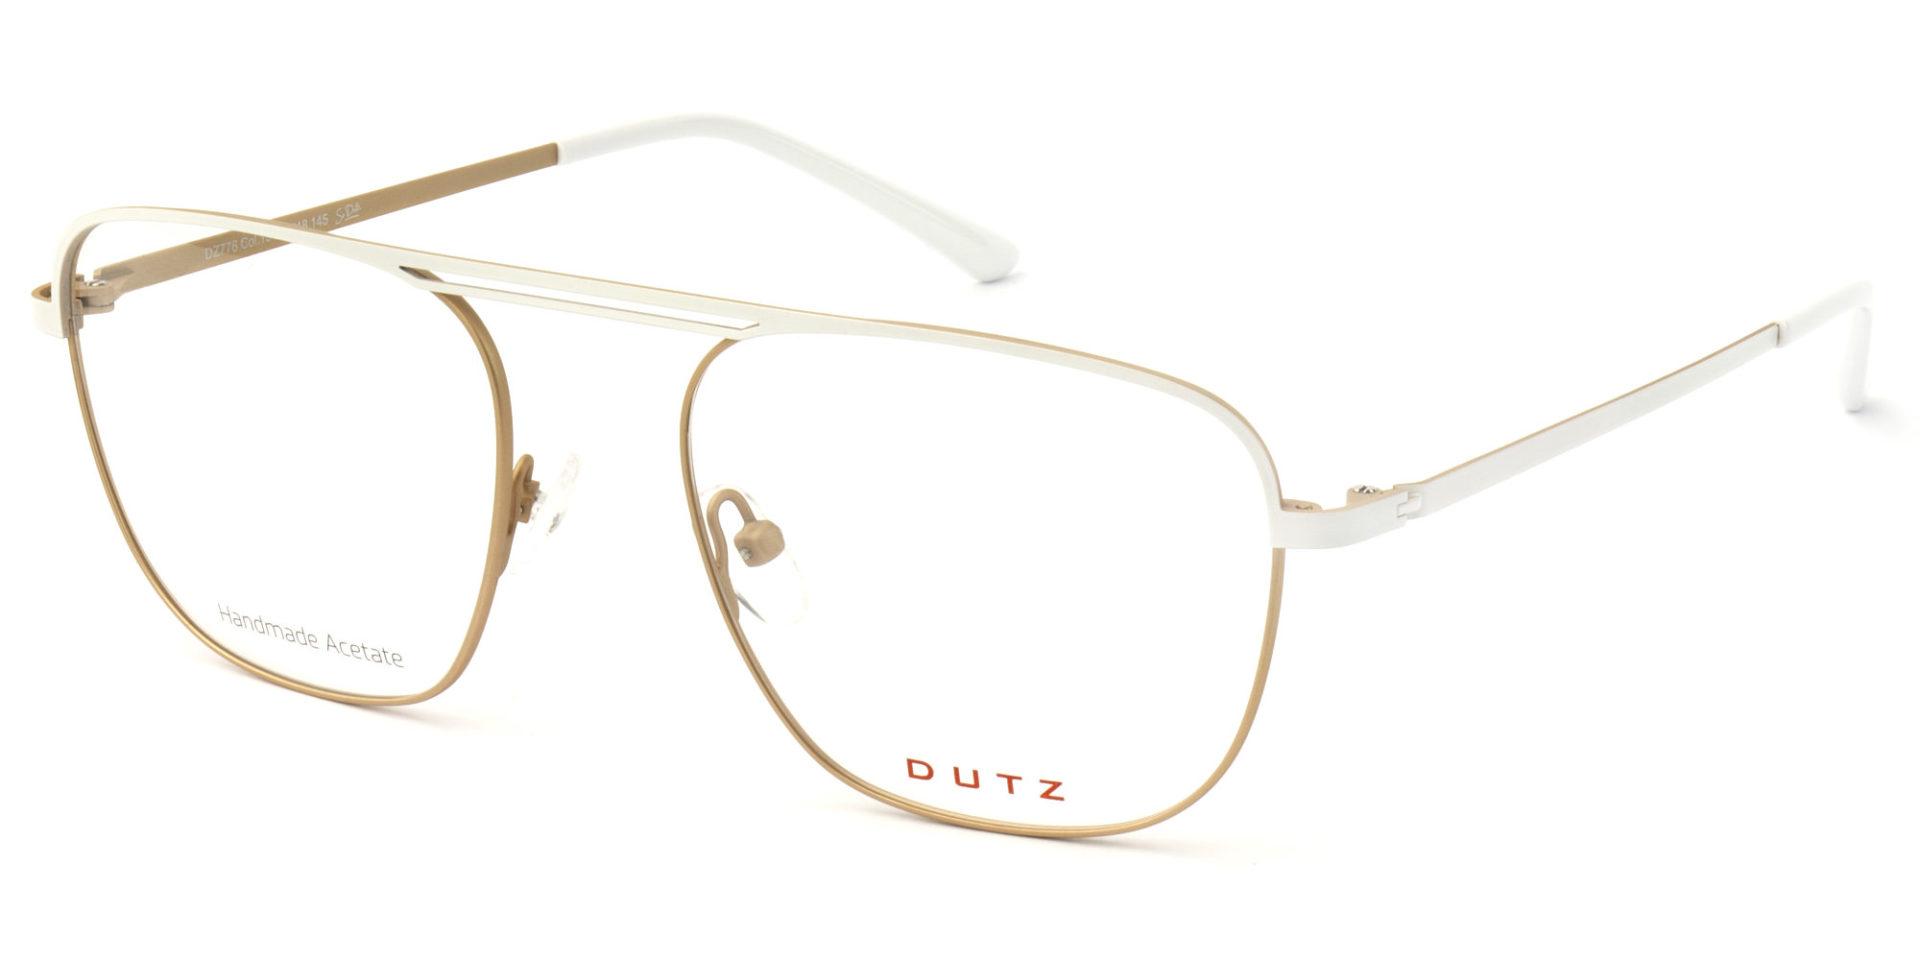 DZ776-15